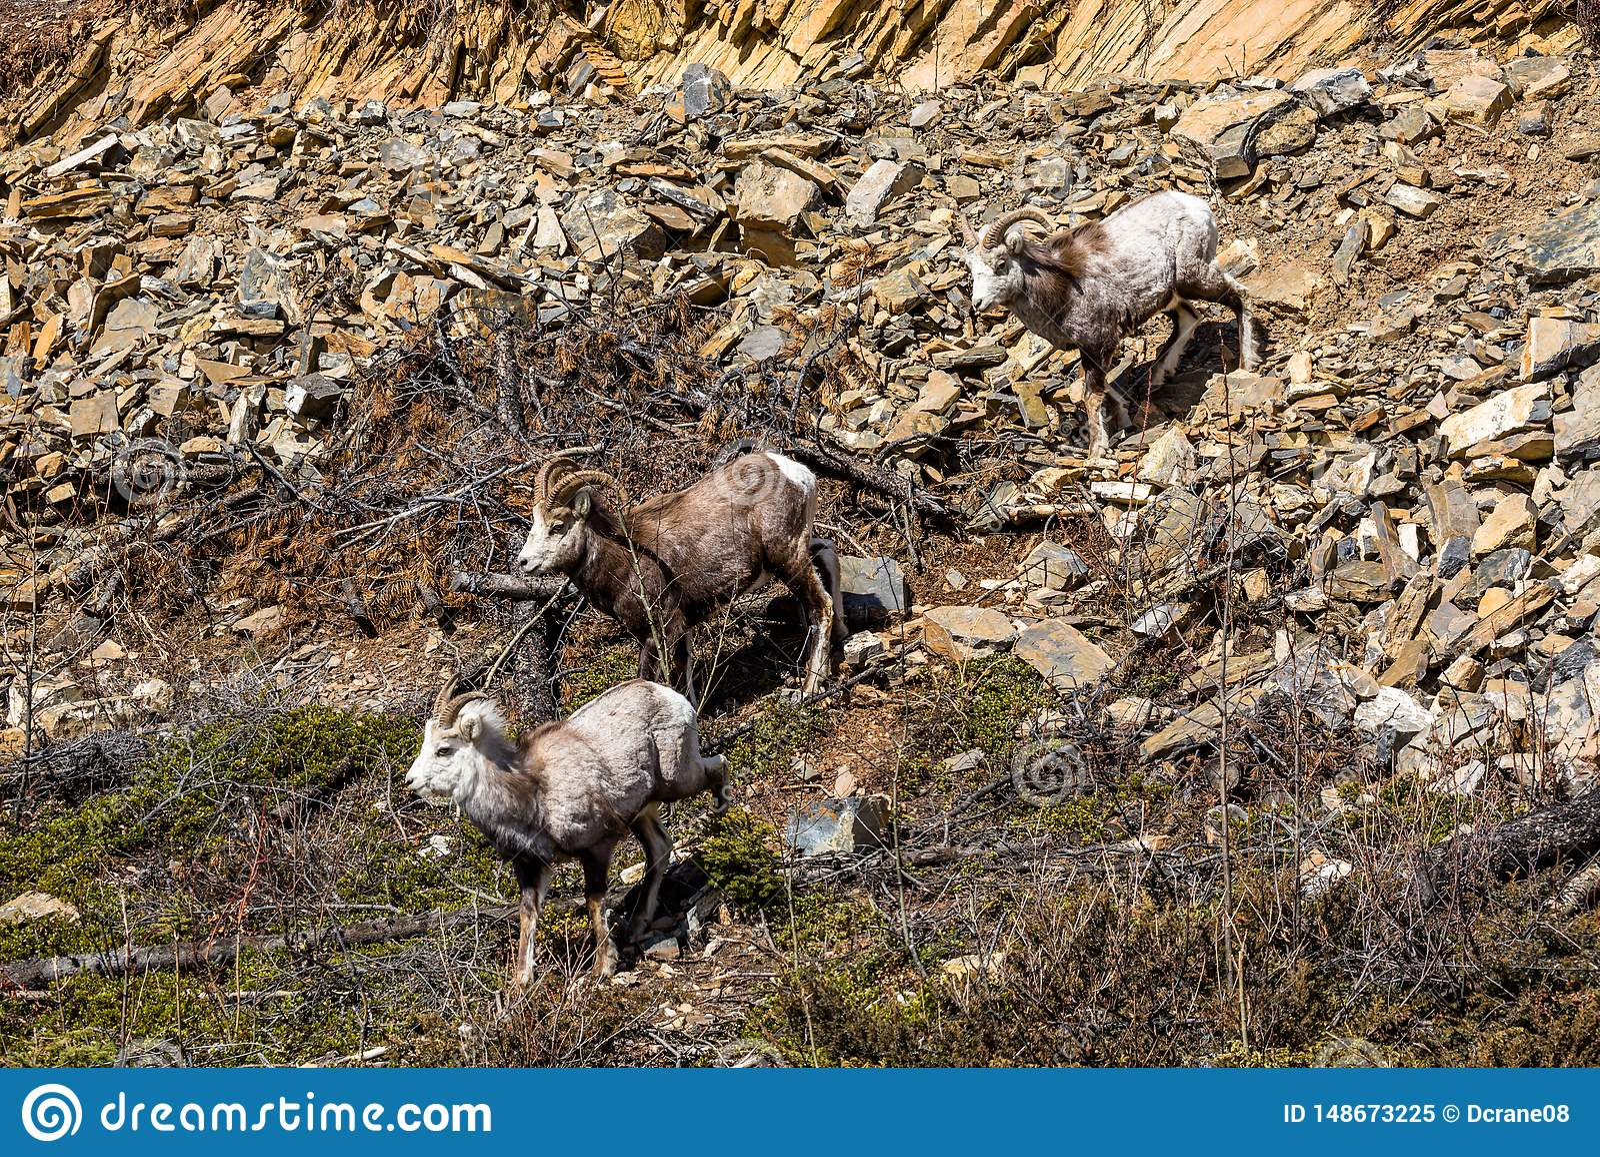 Stone Sheep herd in the Yukon near the Cassiar Highway